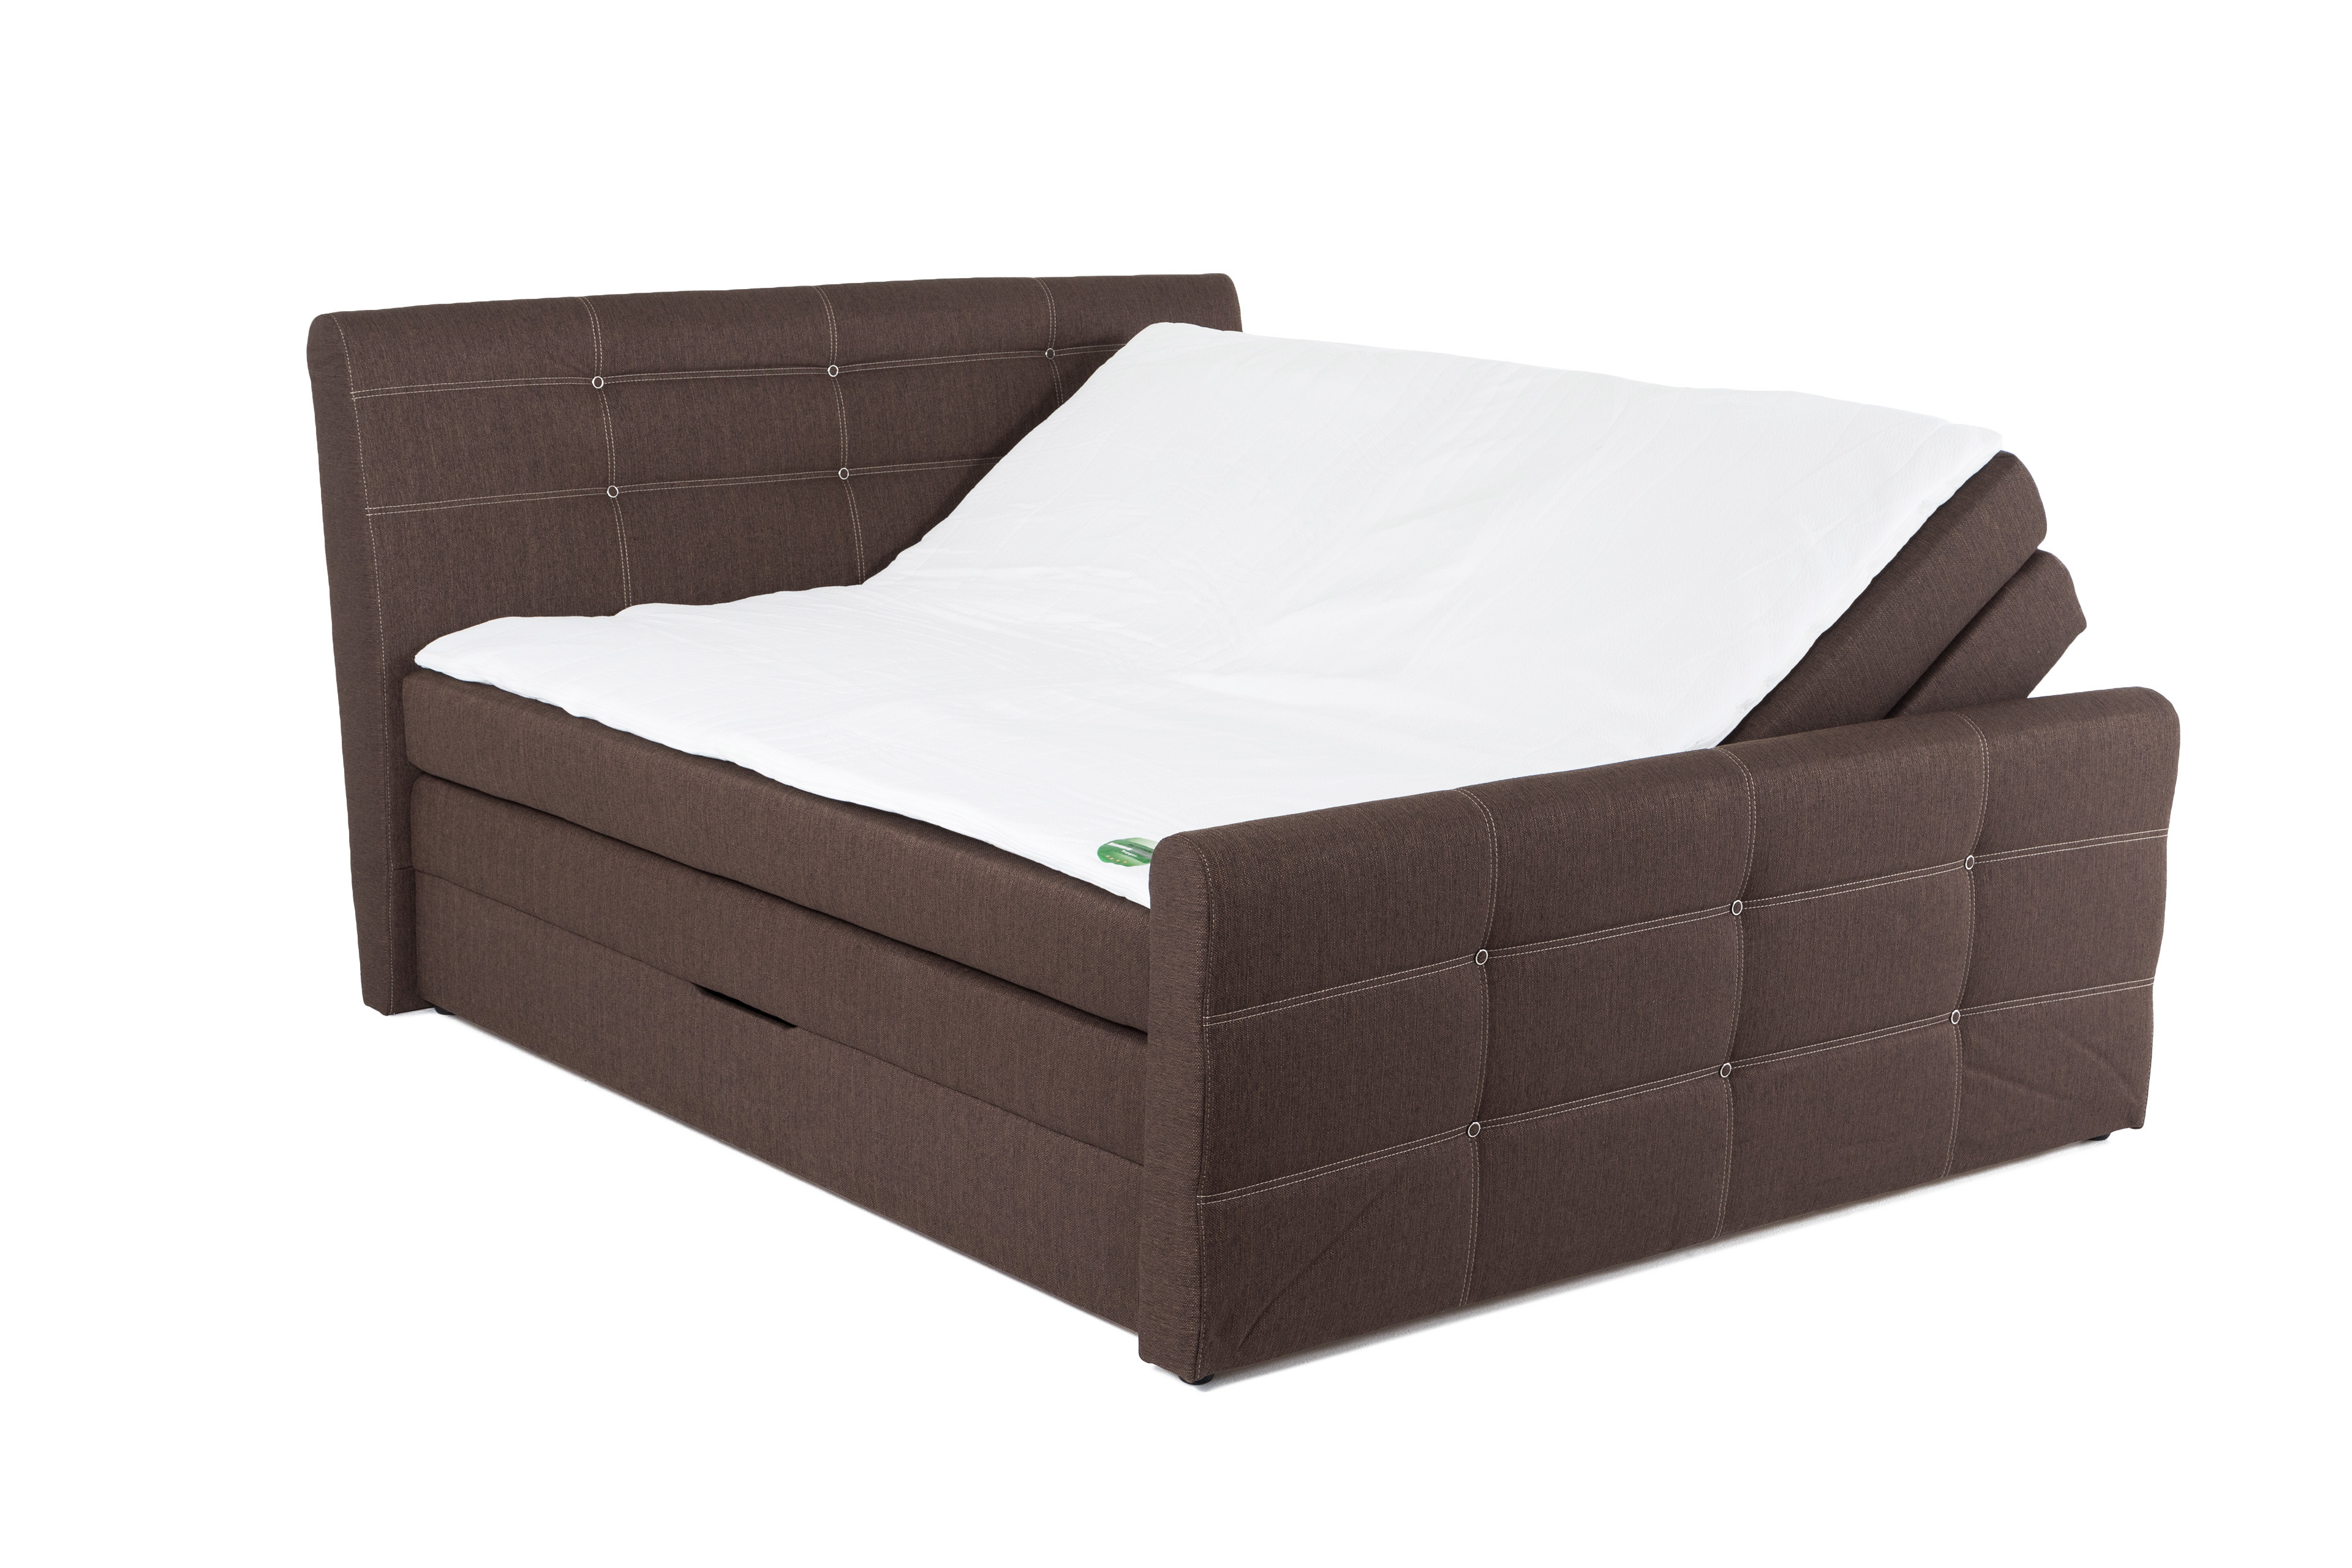 jockenh fer granada leia boxspringbett in braun m bel letz ihr online shop. Black Bedroom Furniture Sets. Home Design Ideas